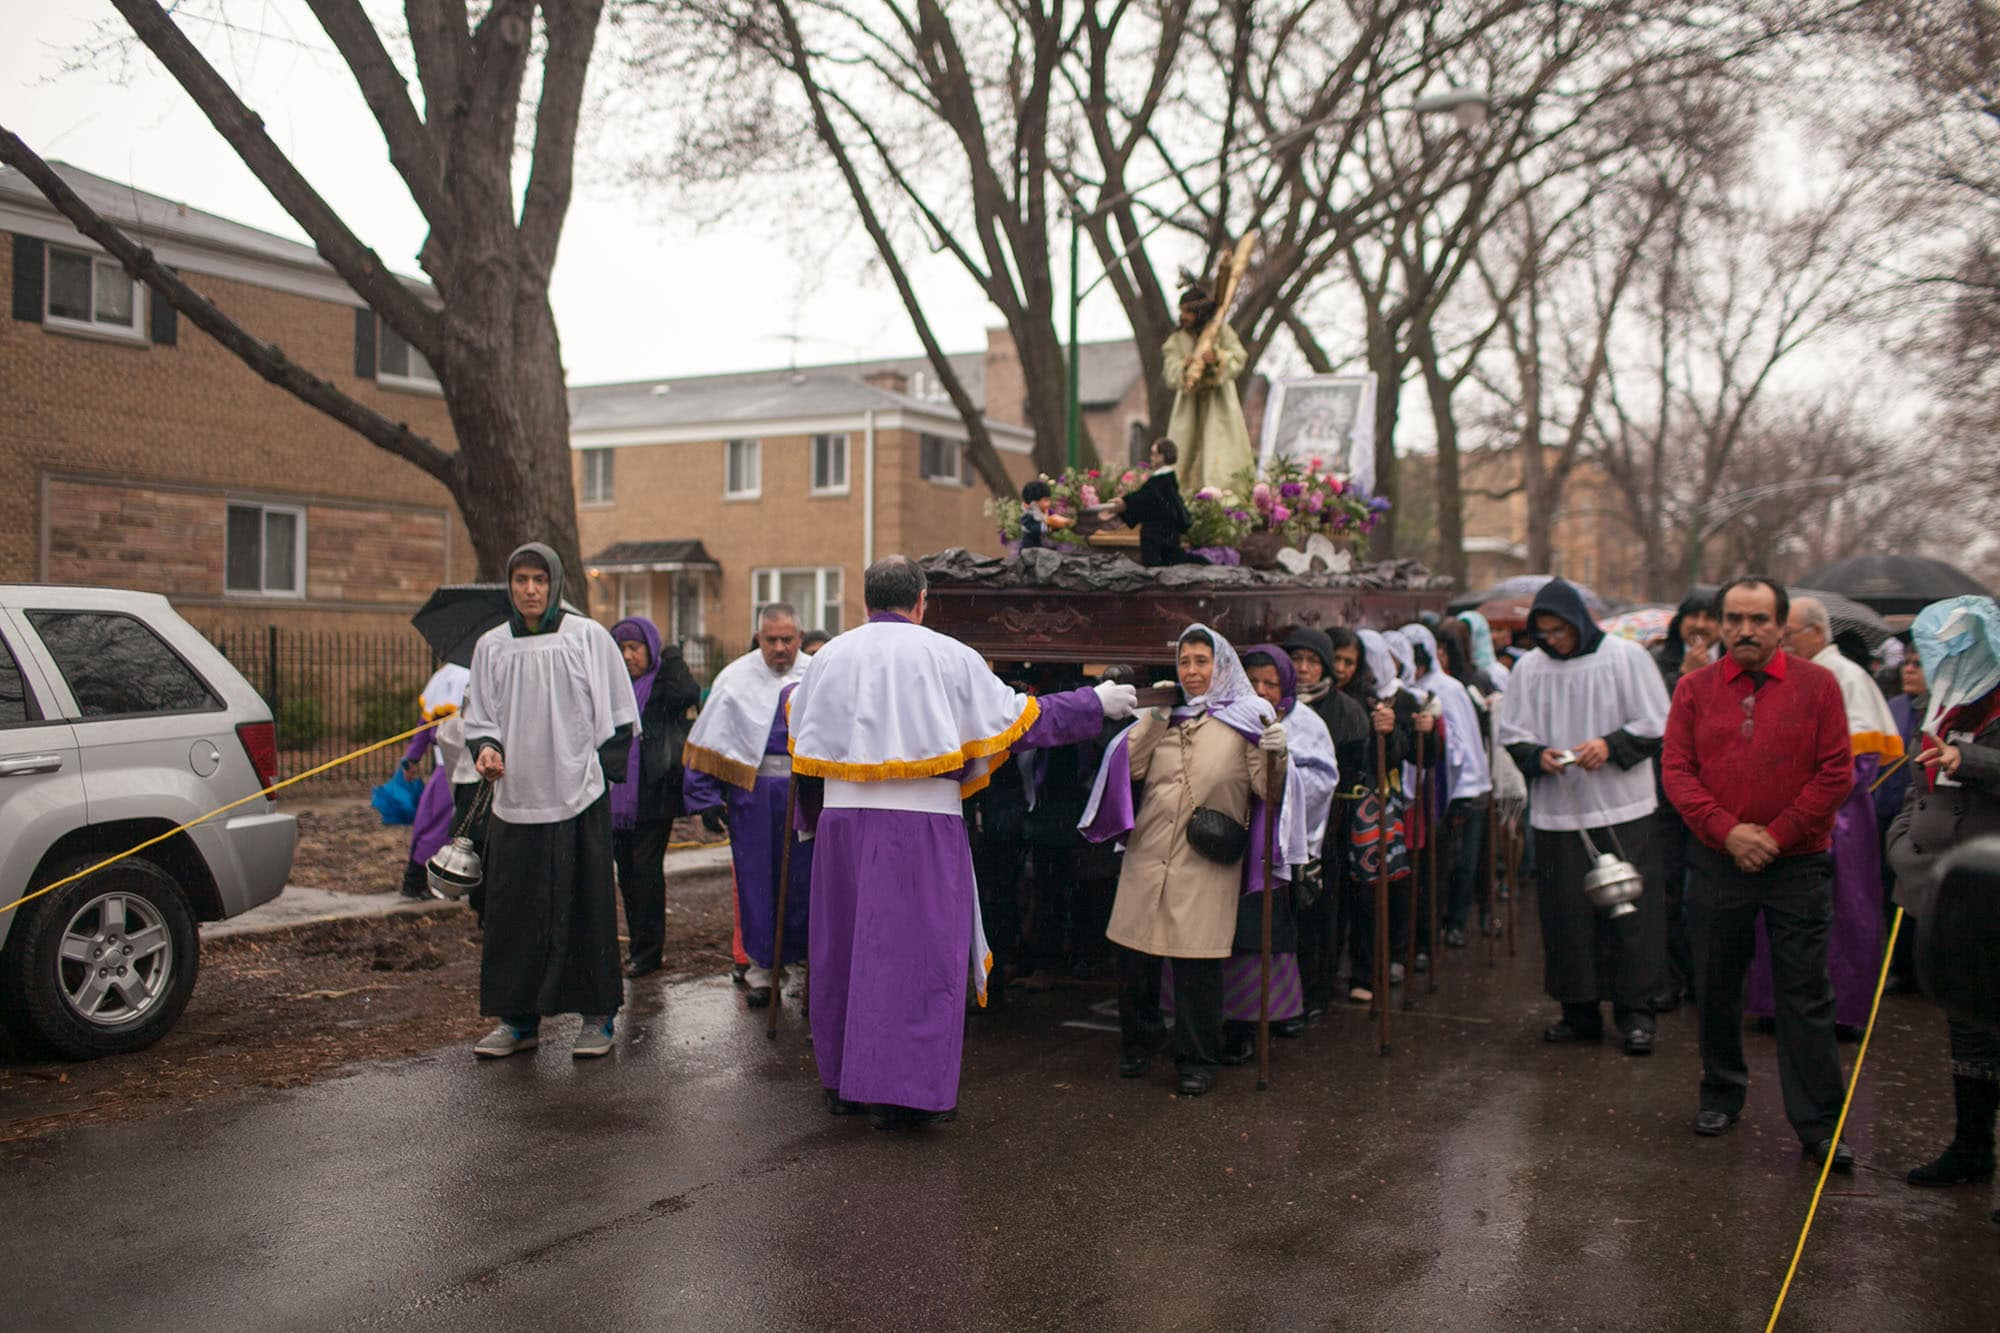 Semana Santa Holy Week Procession in Chicago, Illinois